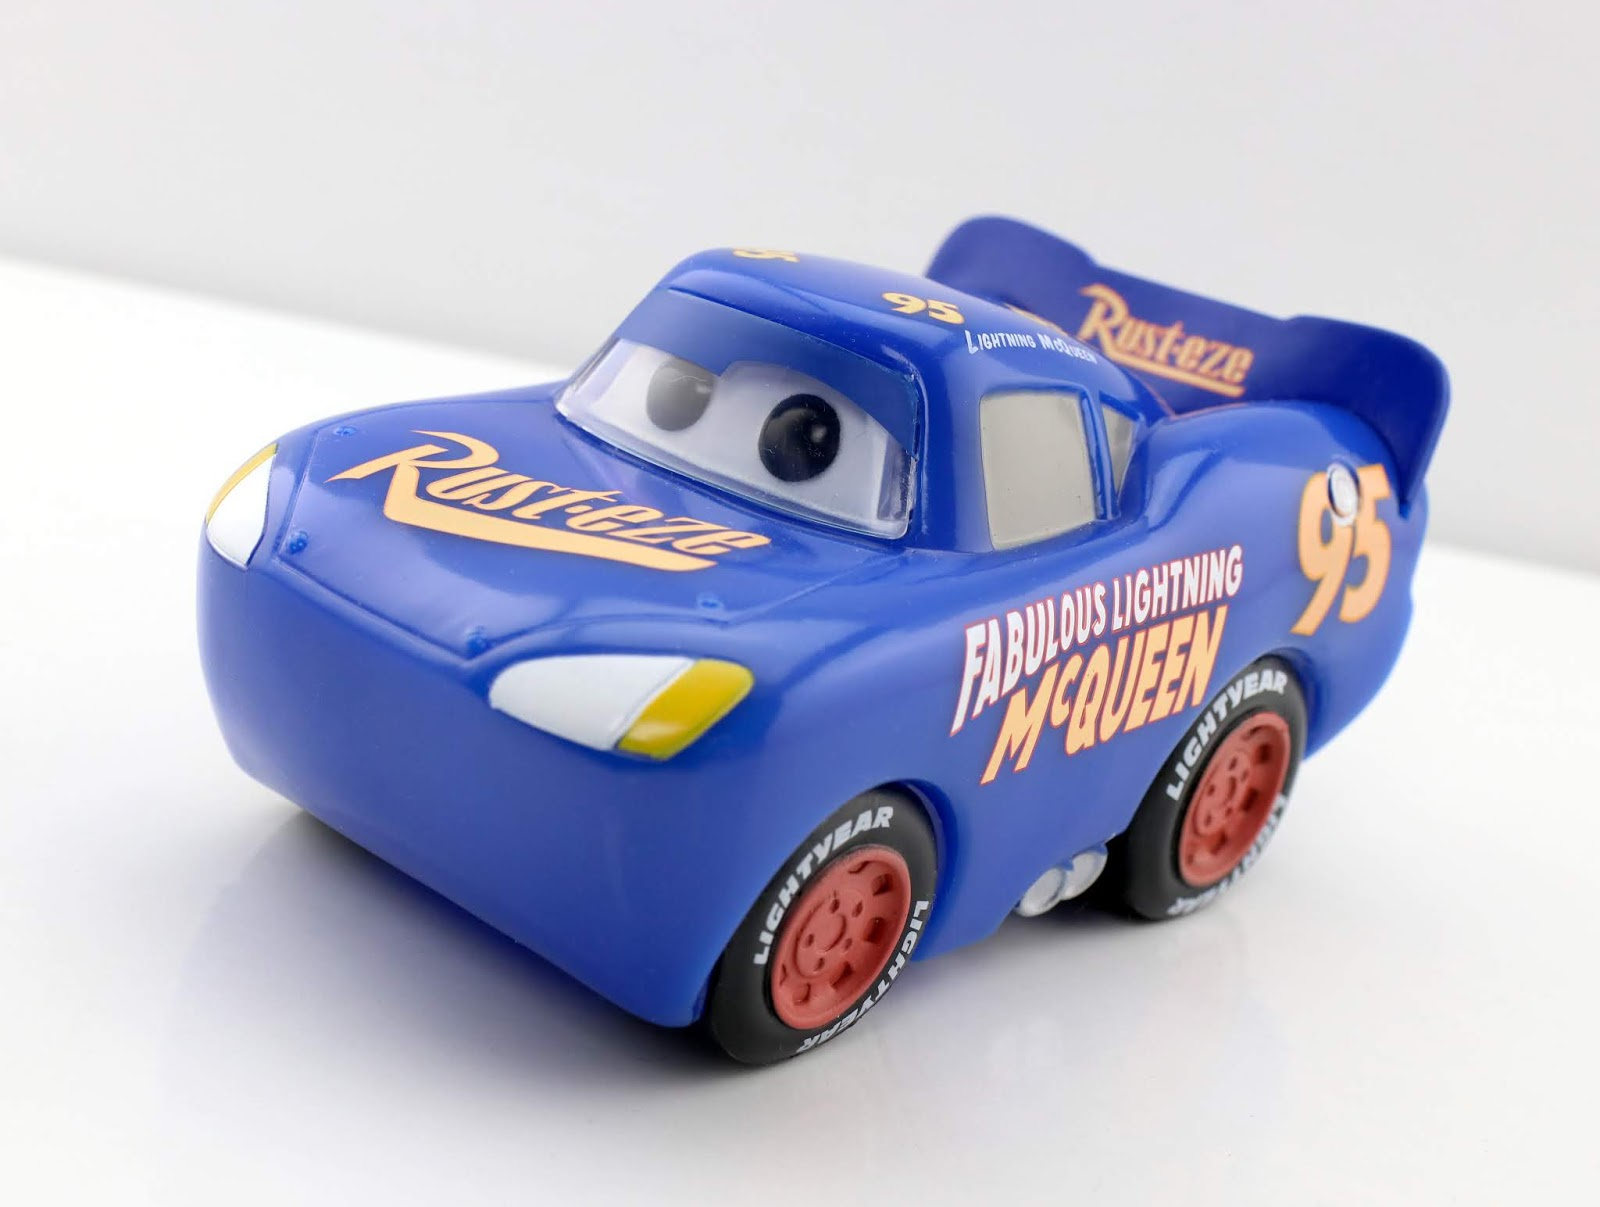 Fabulous Lightning McQueen Toys R Us Exclusive Funko POP